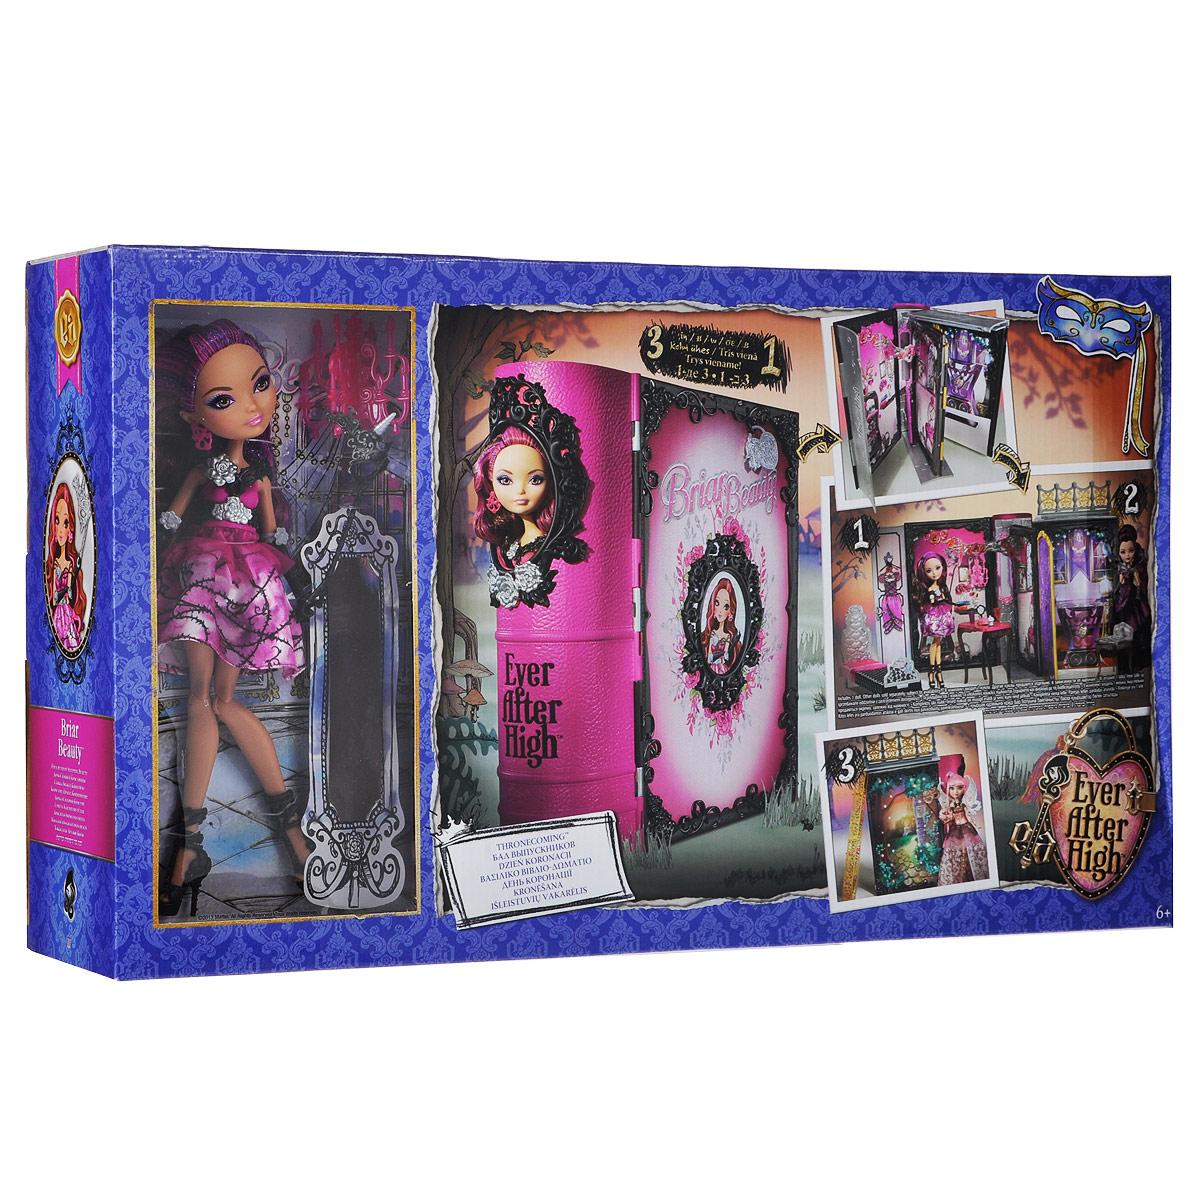 Домик книжка для кукол своими руками эвер афтер хай 4